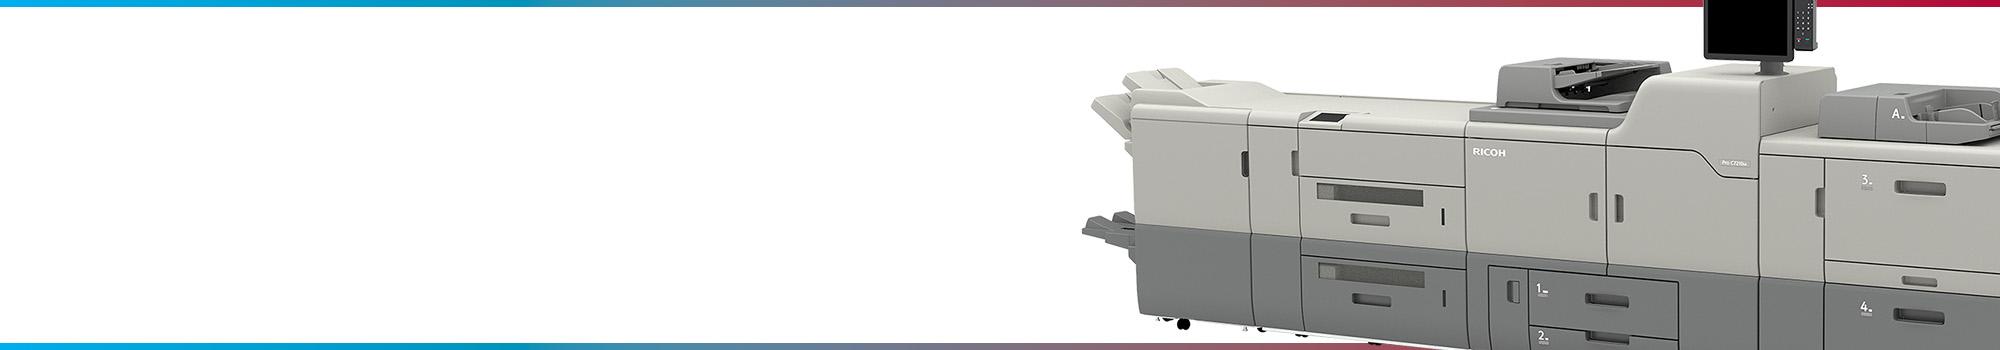 HCI-C7200-Revolution-slider